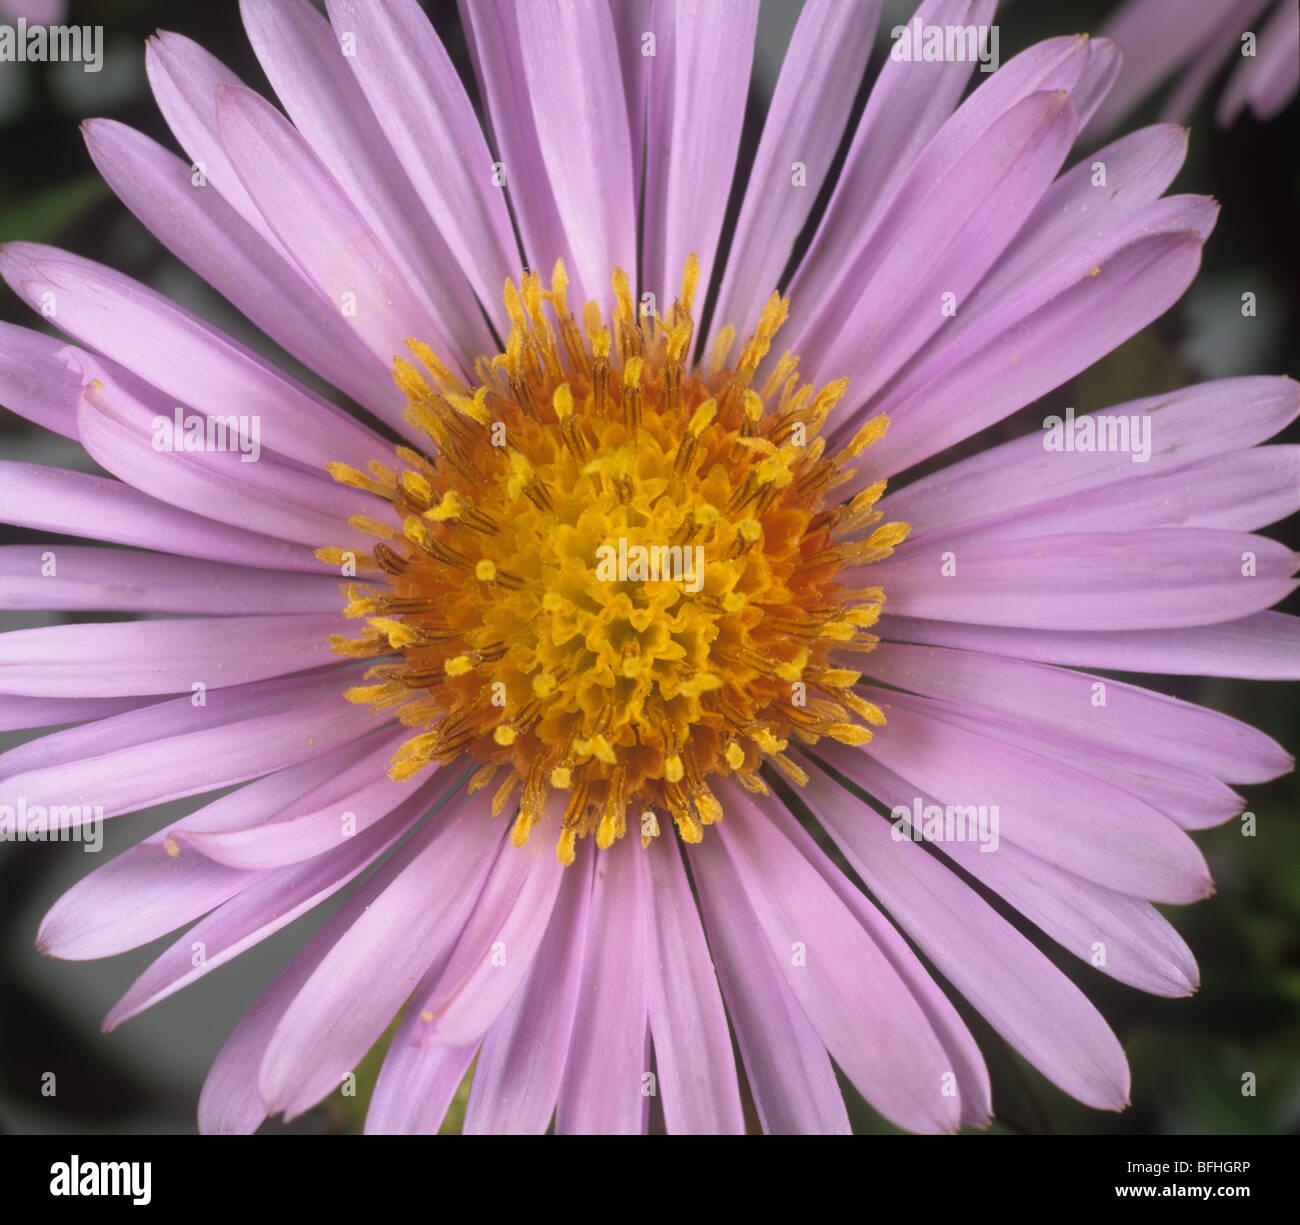 Michaelmas daisy aster novi belgii a typical composite daisy michaelmas daisy aster novi belgii a typical composite daisy flower izmirmasajfo Image collections